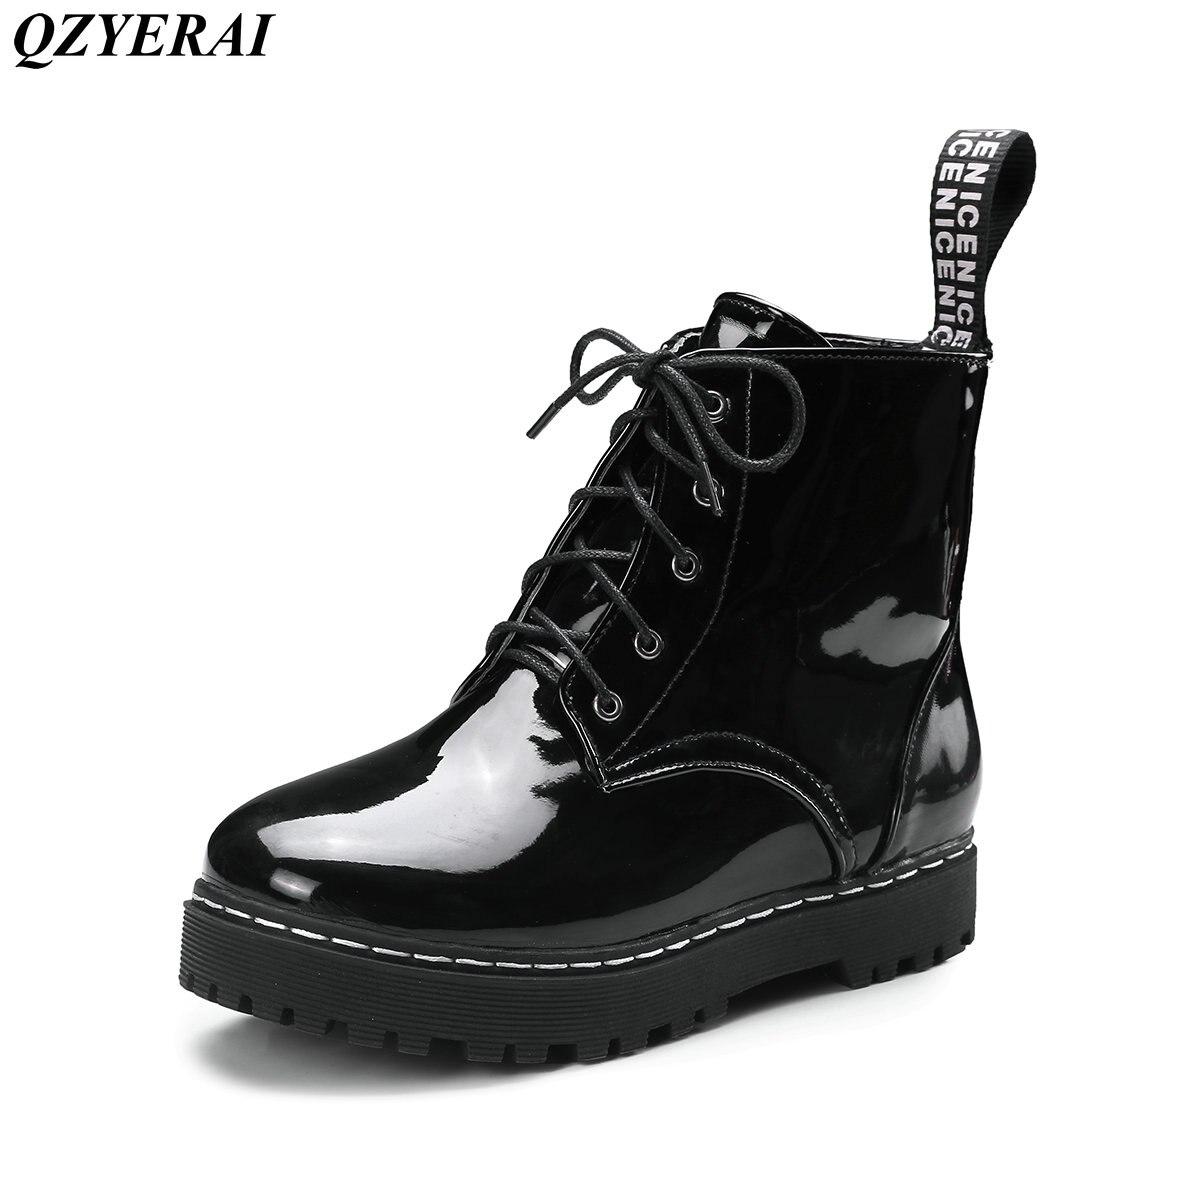 QZYERAI Autumn and winter low heel belt classic vintage Martin boots font b women s b